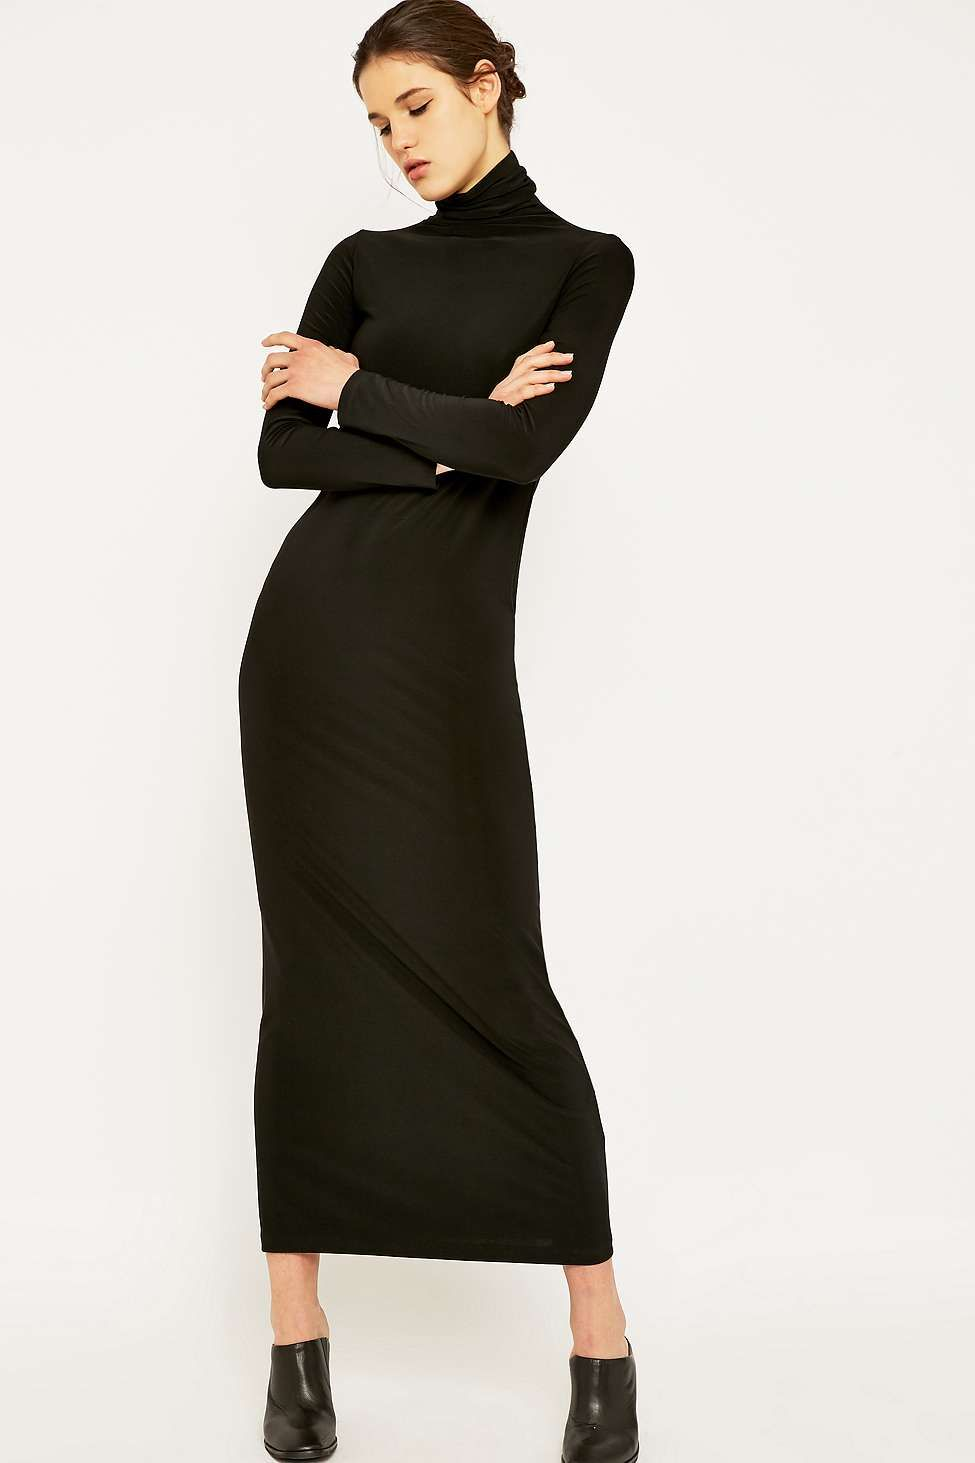 Kamali kulture go turtleneck maxi dress my kind of style